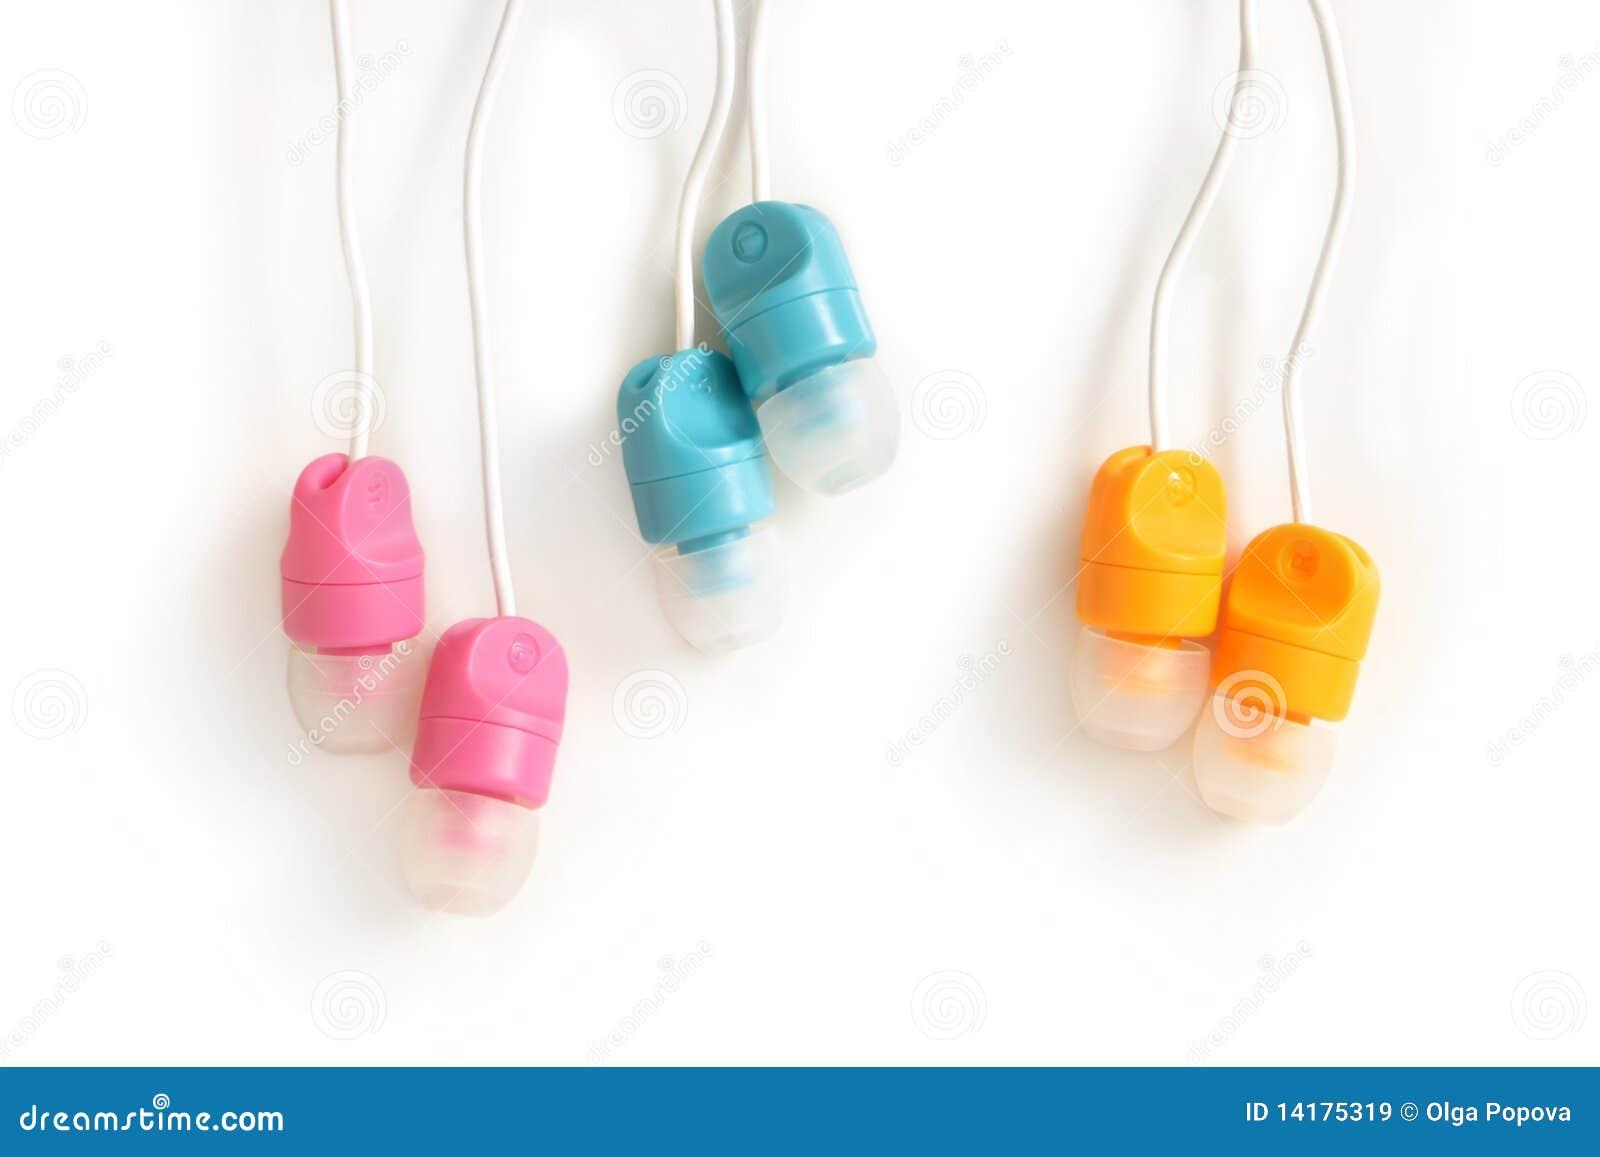 Multicolored earphones